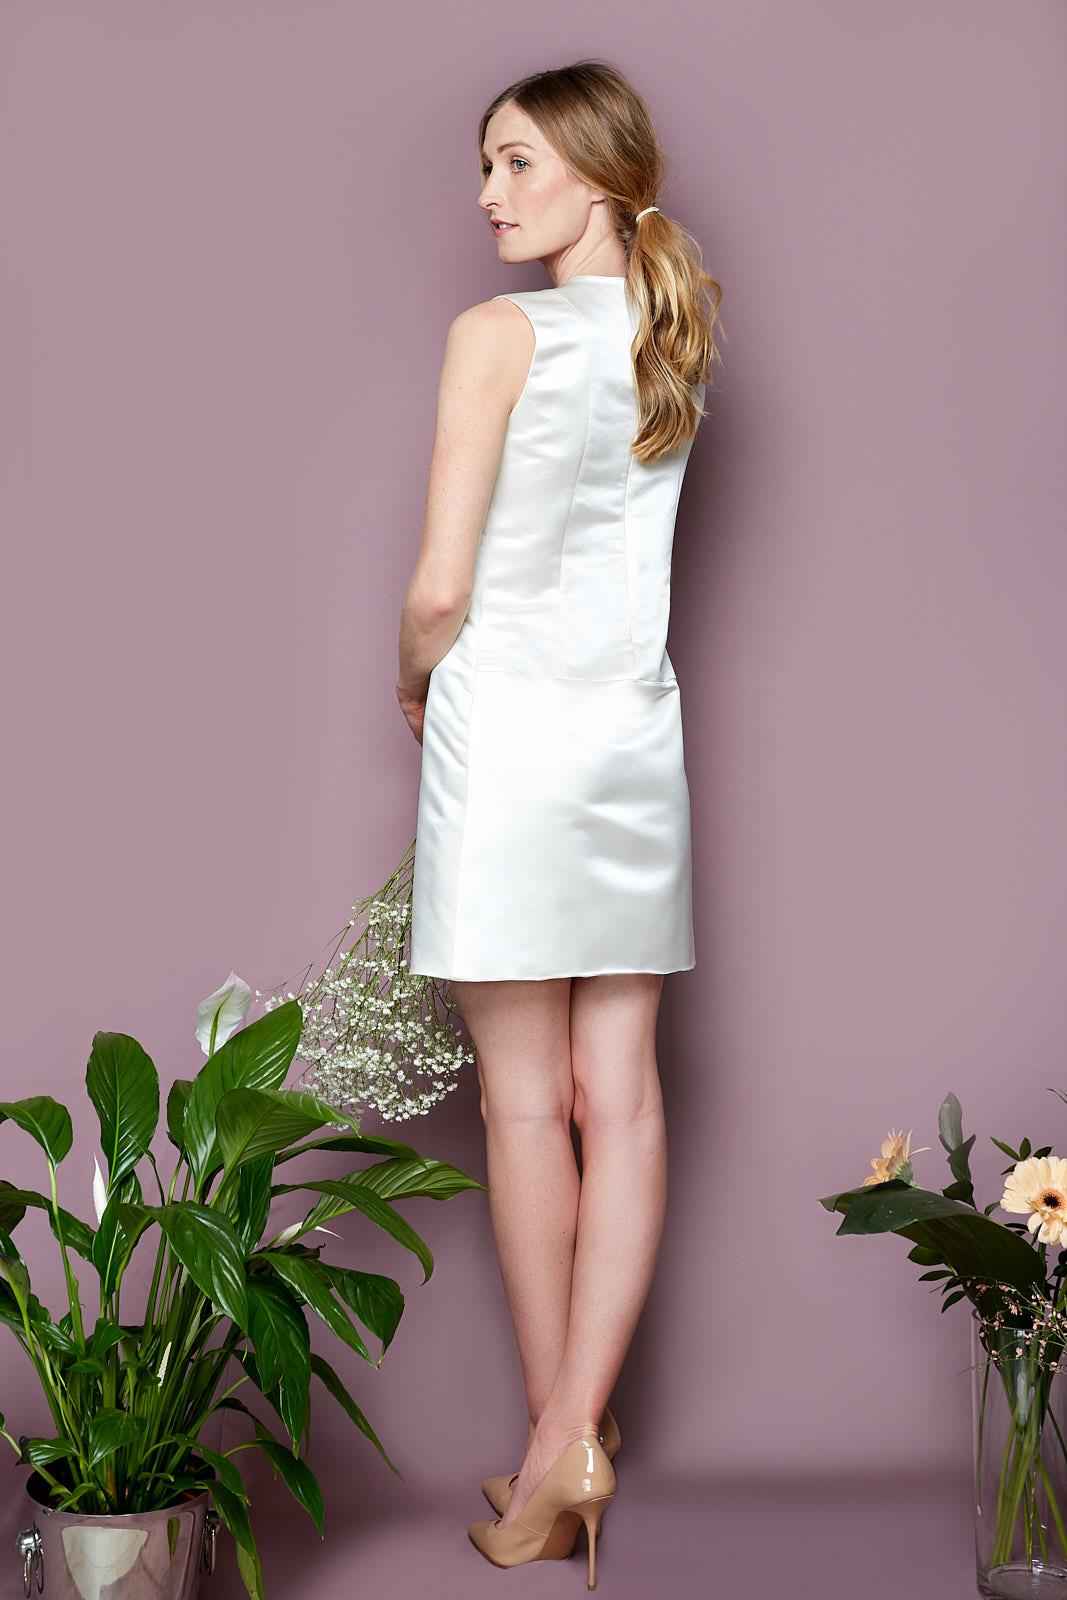 ALBA Dress  60's Inspired Mod Dress in Duchesse Silk, lined in Silky Viscose